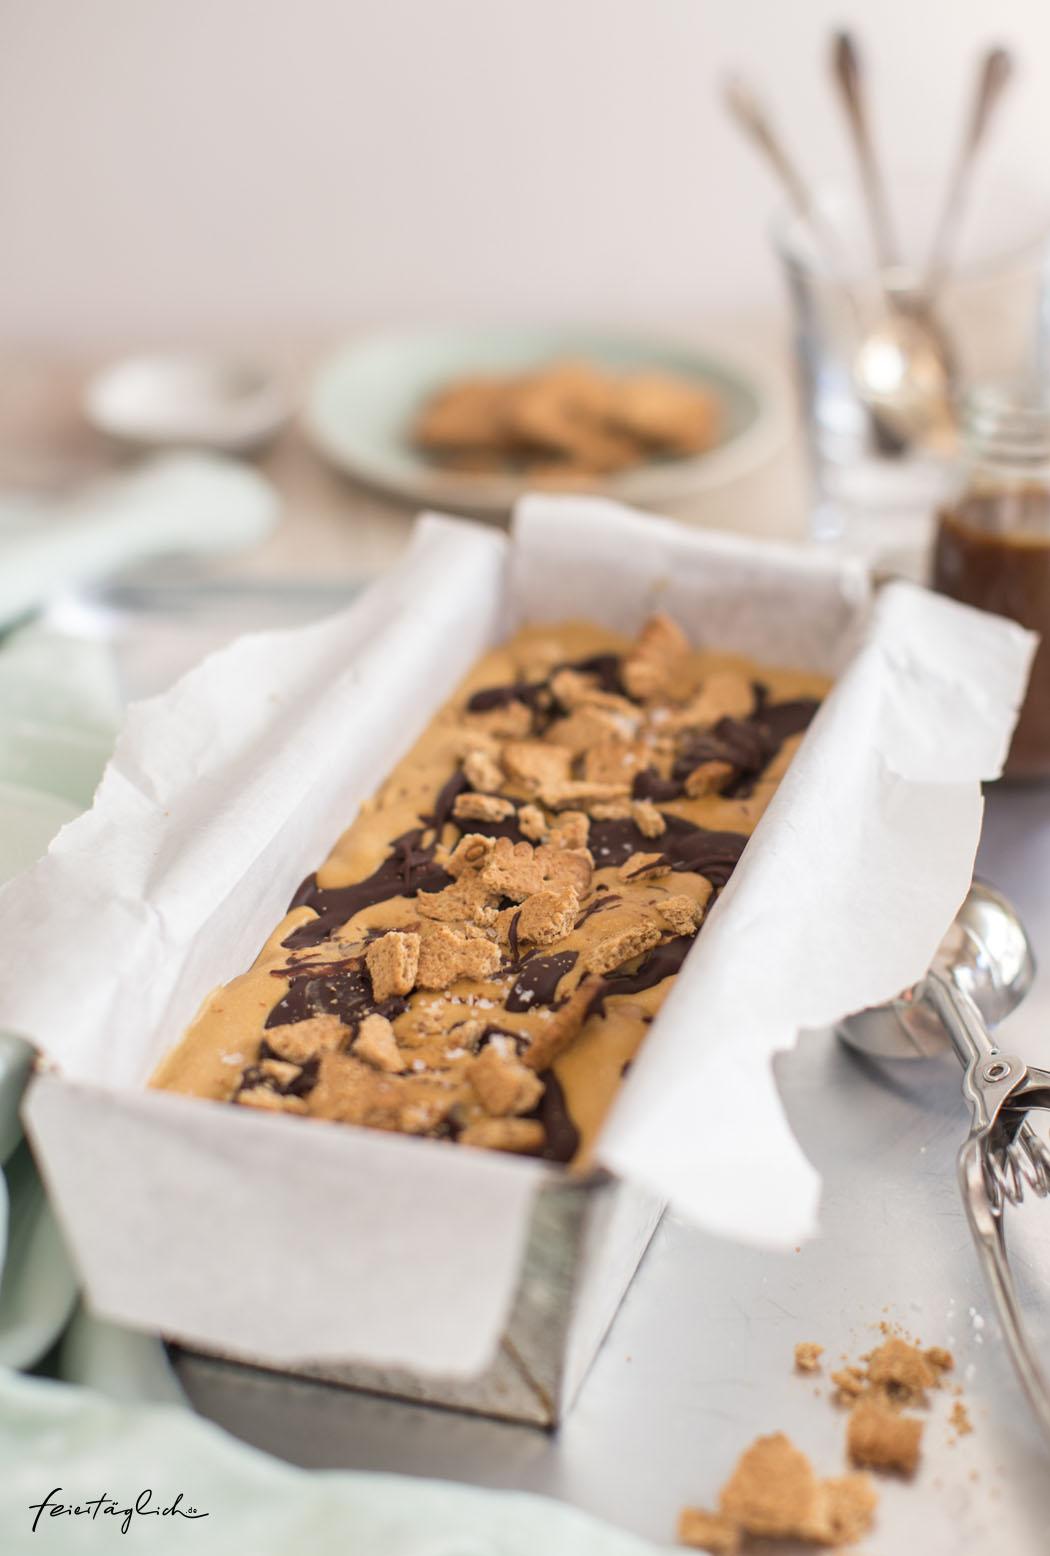 Salted Caramel-Schoko-Keks-Eis mit extra Karamellsauce – Rezept für das feisteste Eis ever